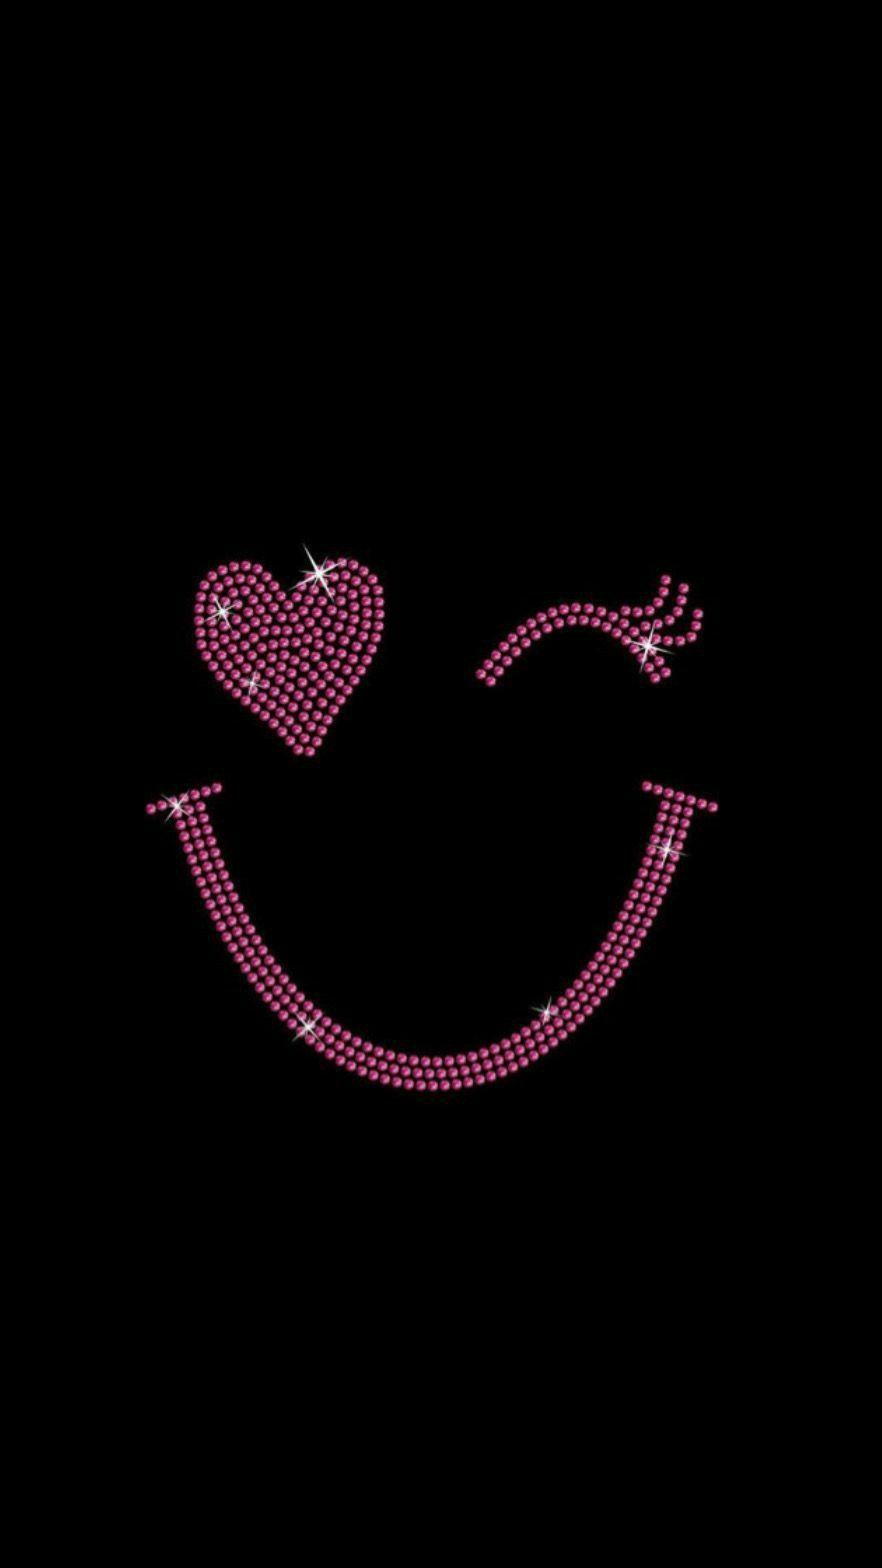 Pin By Angeli Kwauk On Rainbow Heart Flower Phone Wallpaper Glitter Phone Wallpaper Happy Wallpaper